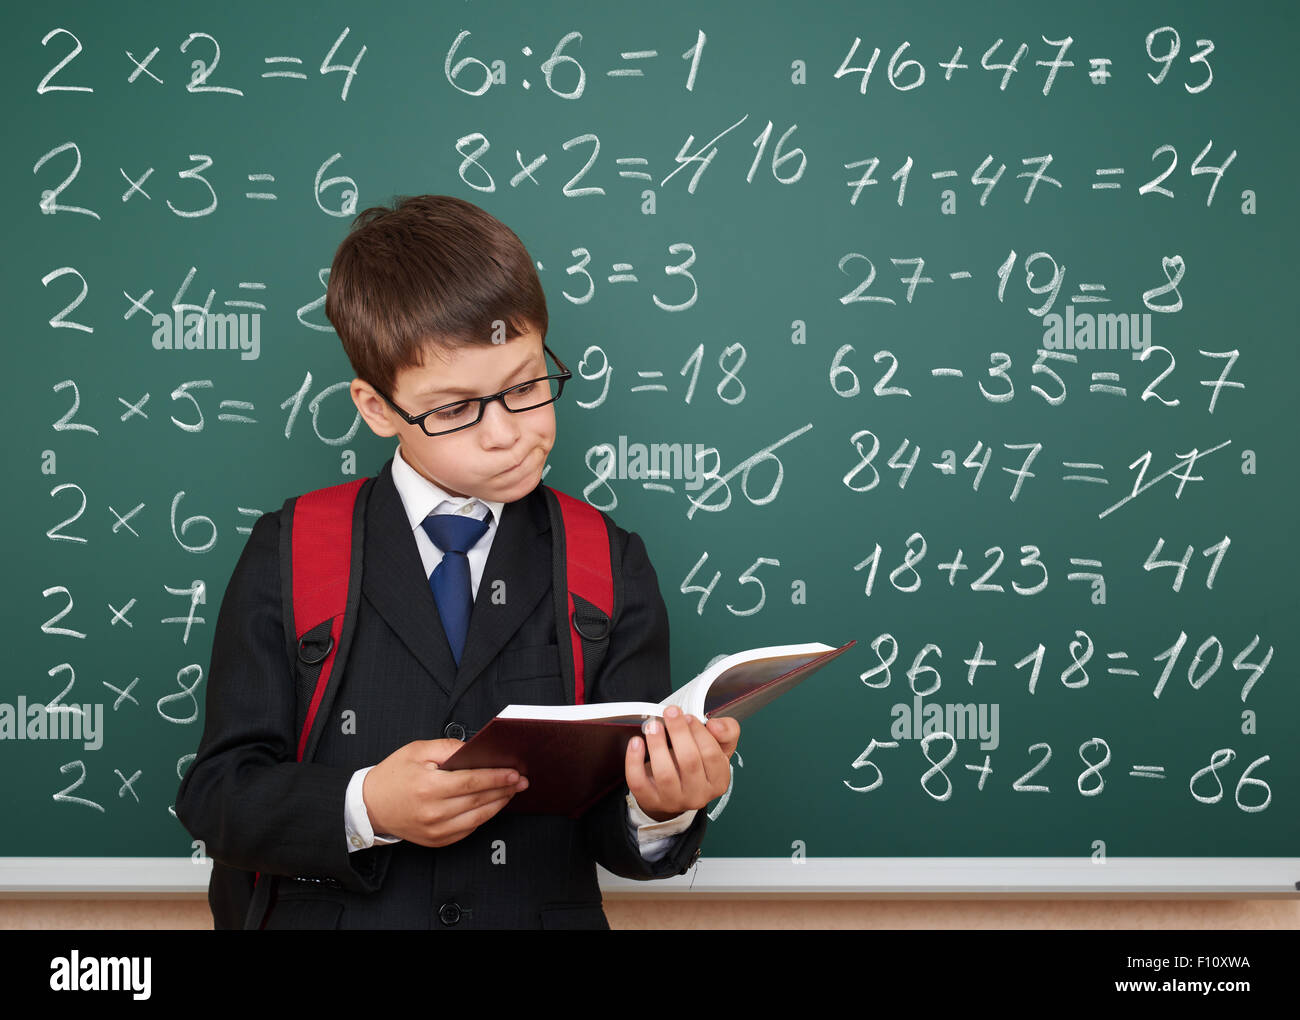 Math Exercise Stock Photos & Math Exercise Stock Images - Alamy